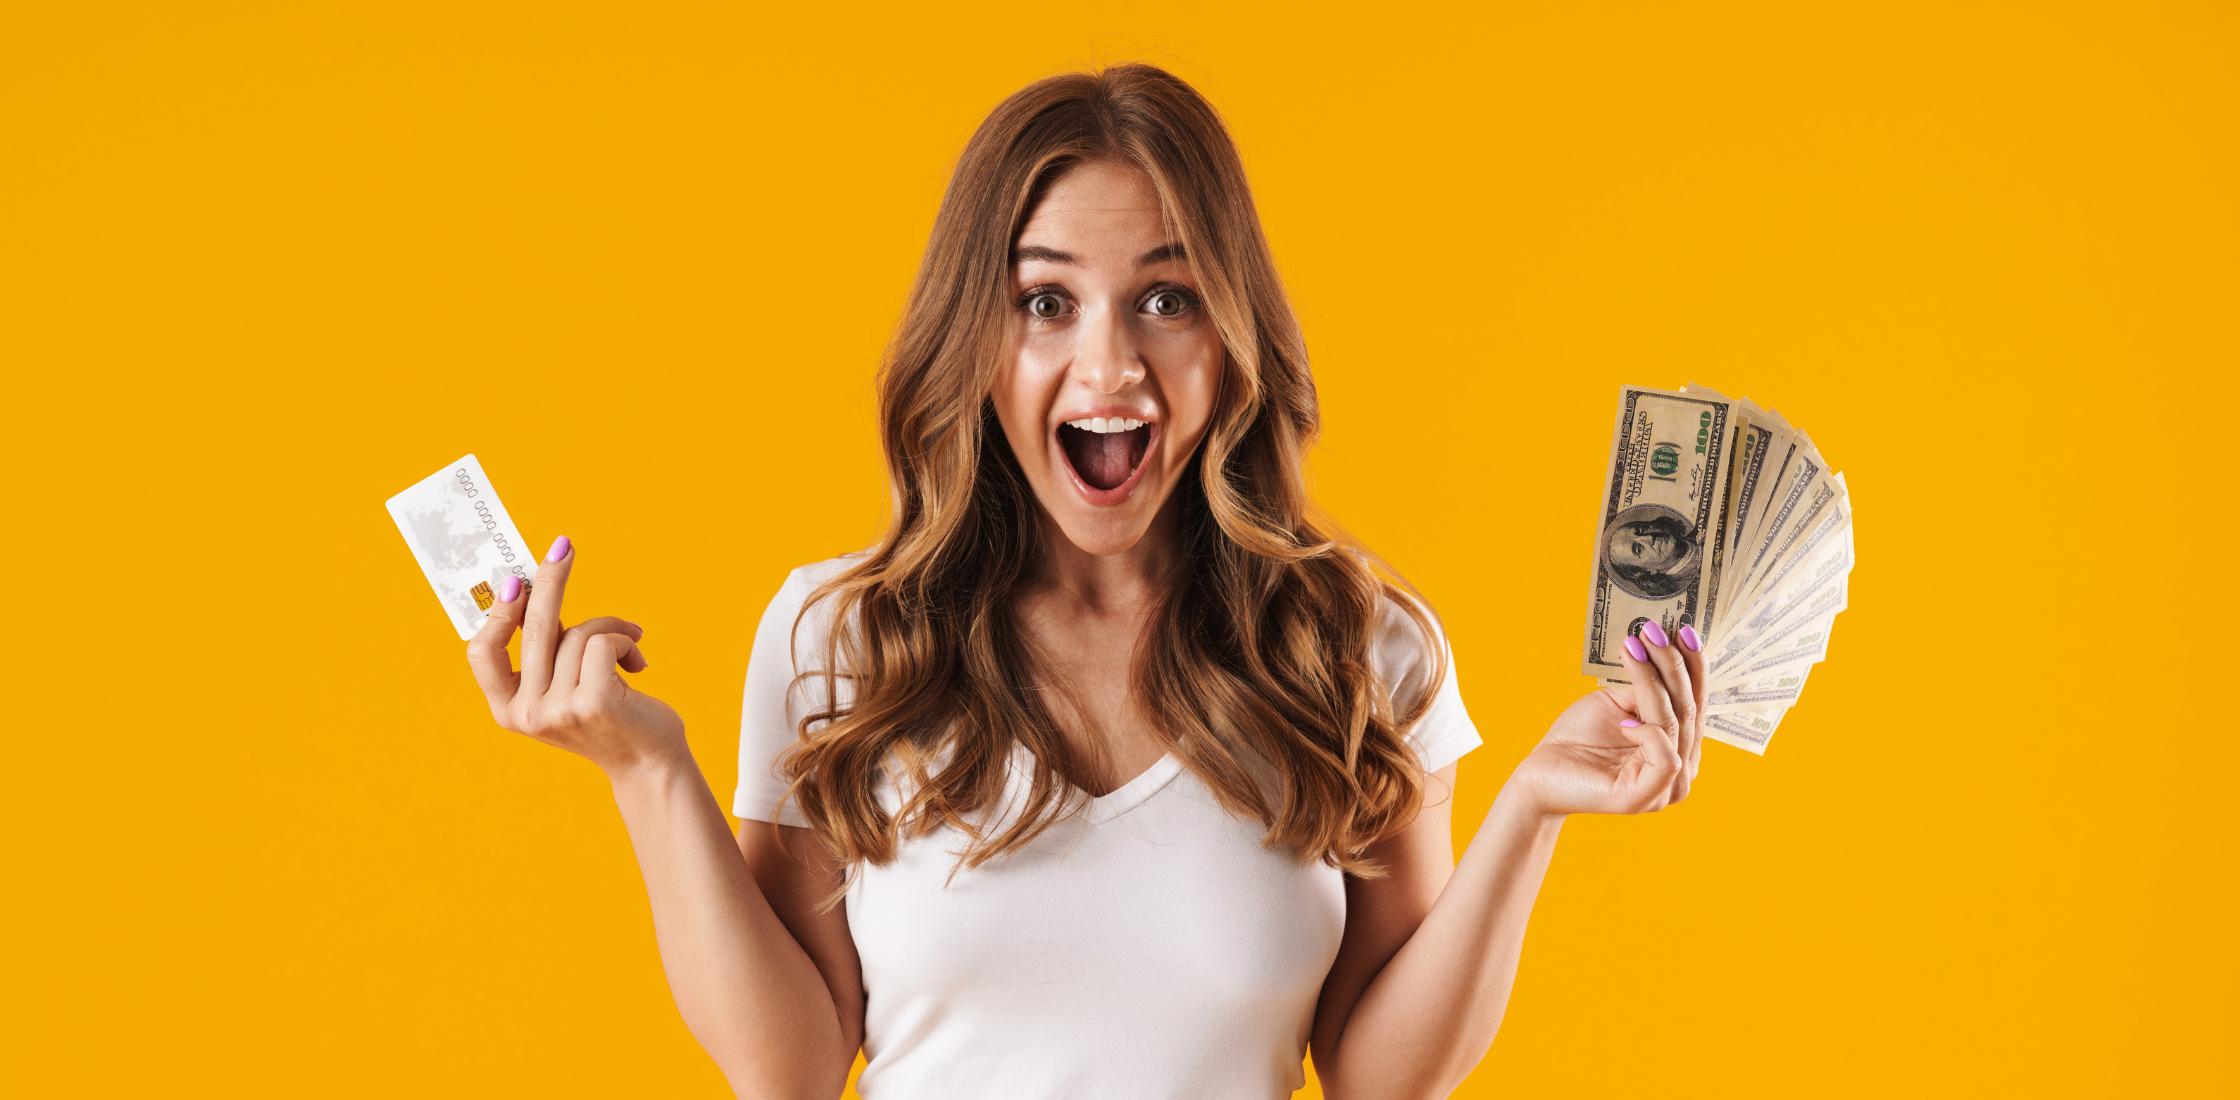 Bezahl-Podcasts bei Apple und Spotify